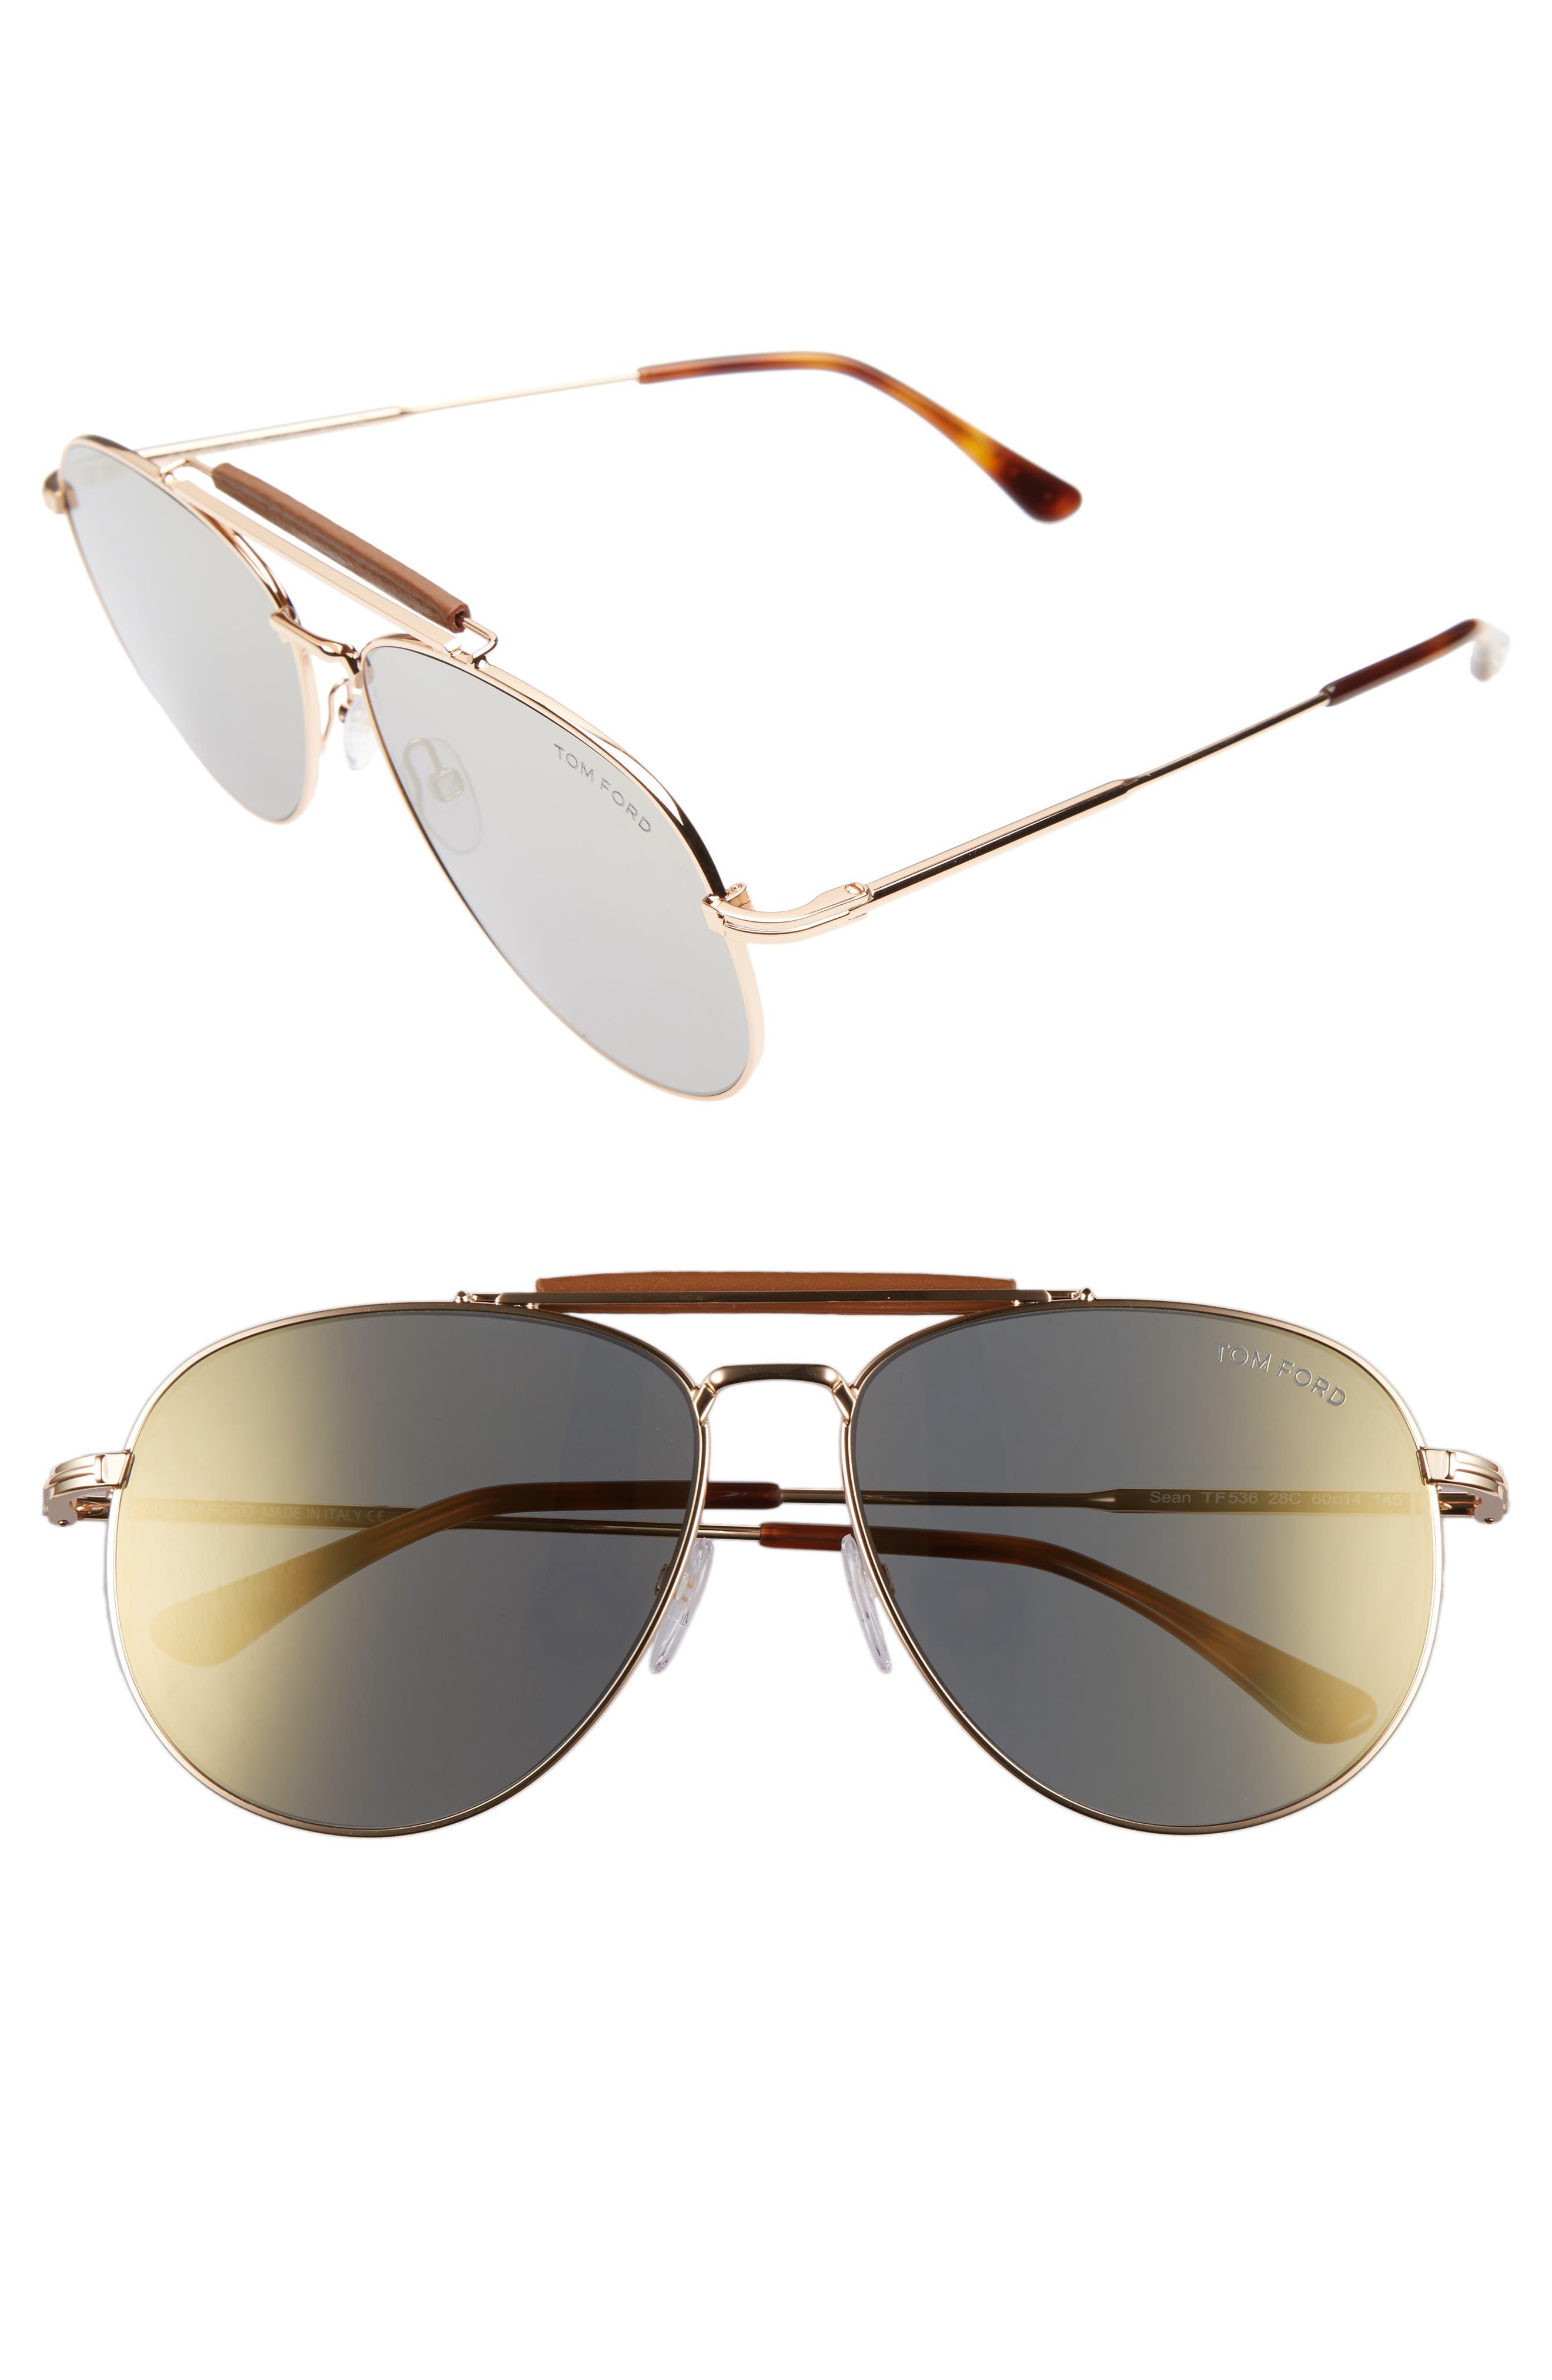 Sean 60mm Aviator Sunglasses,                         Main,                         color, 710